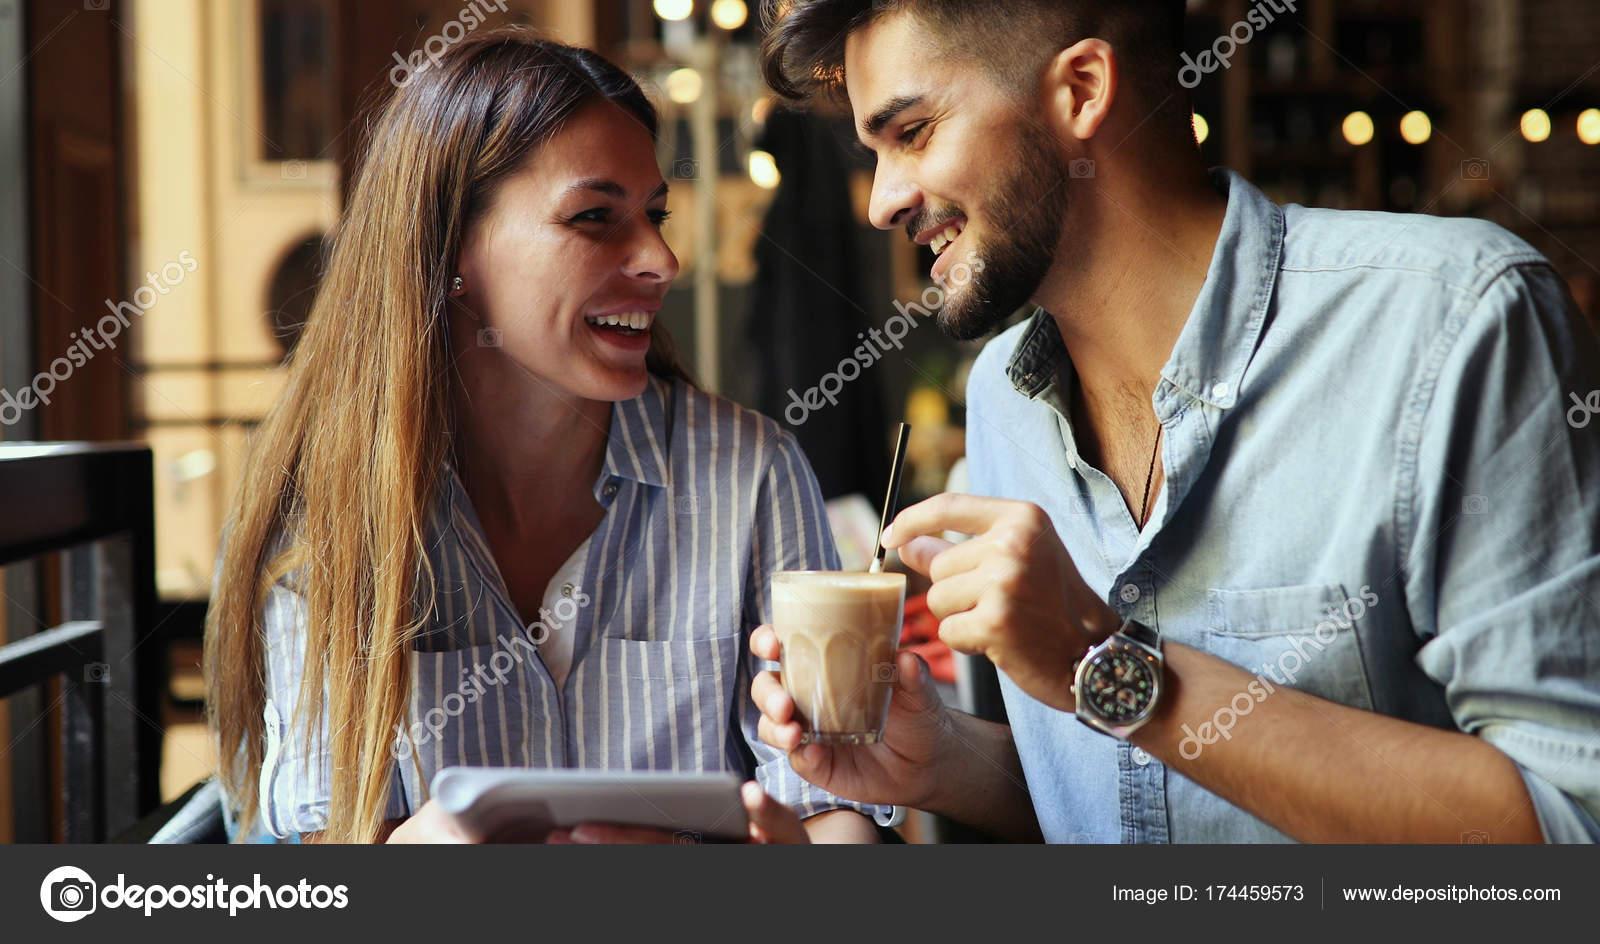 Dating Coffee shop